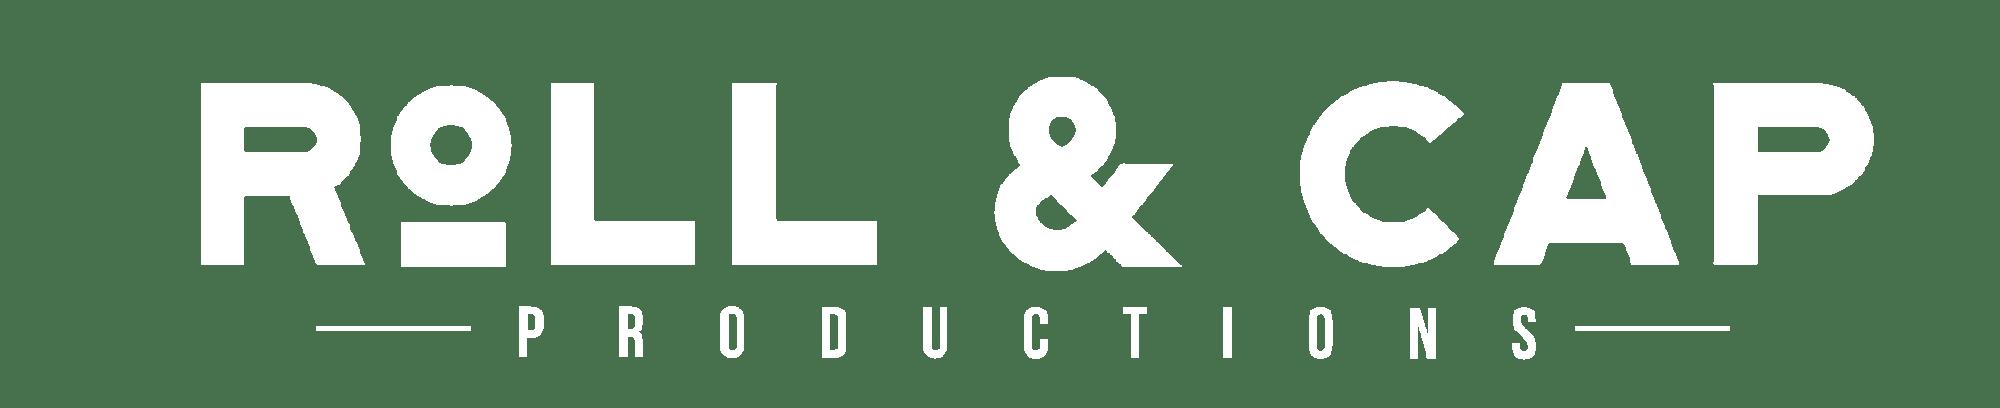 Roll and Cap Logo - Eric Higginbotham